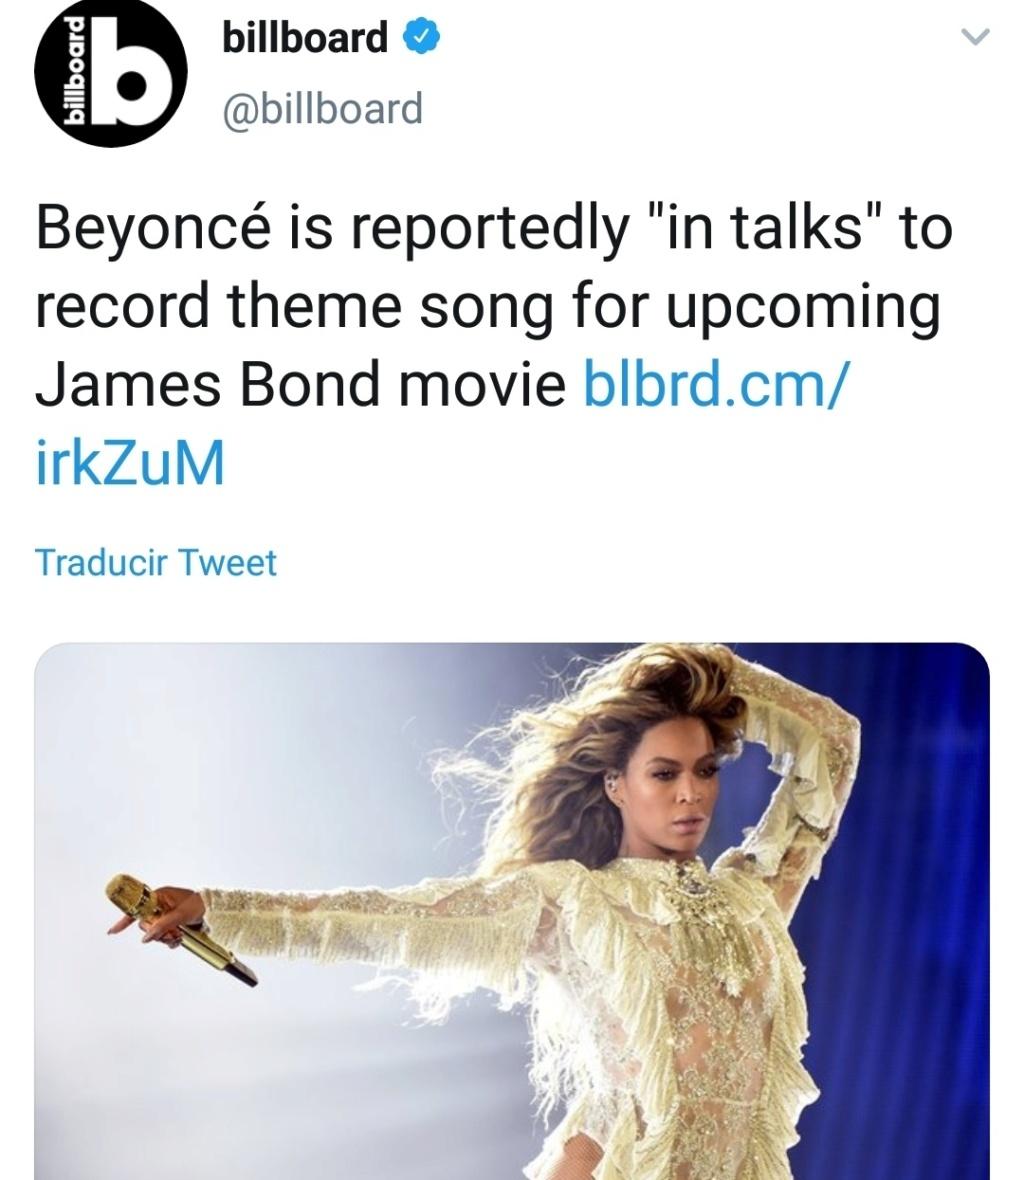 Beyoncé >> preparando nuevo álbum - Página 33 Img_2263